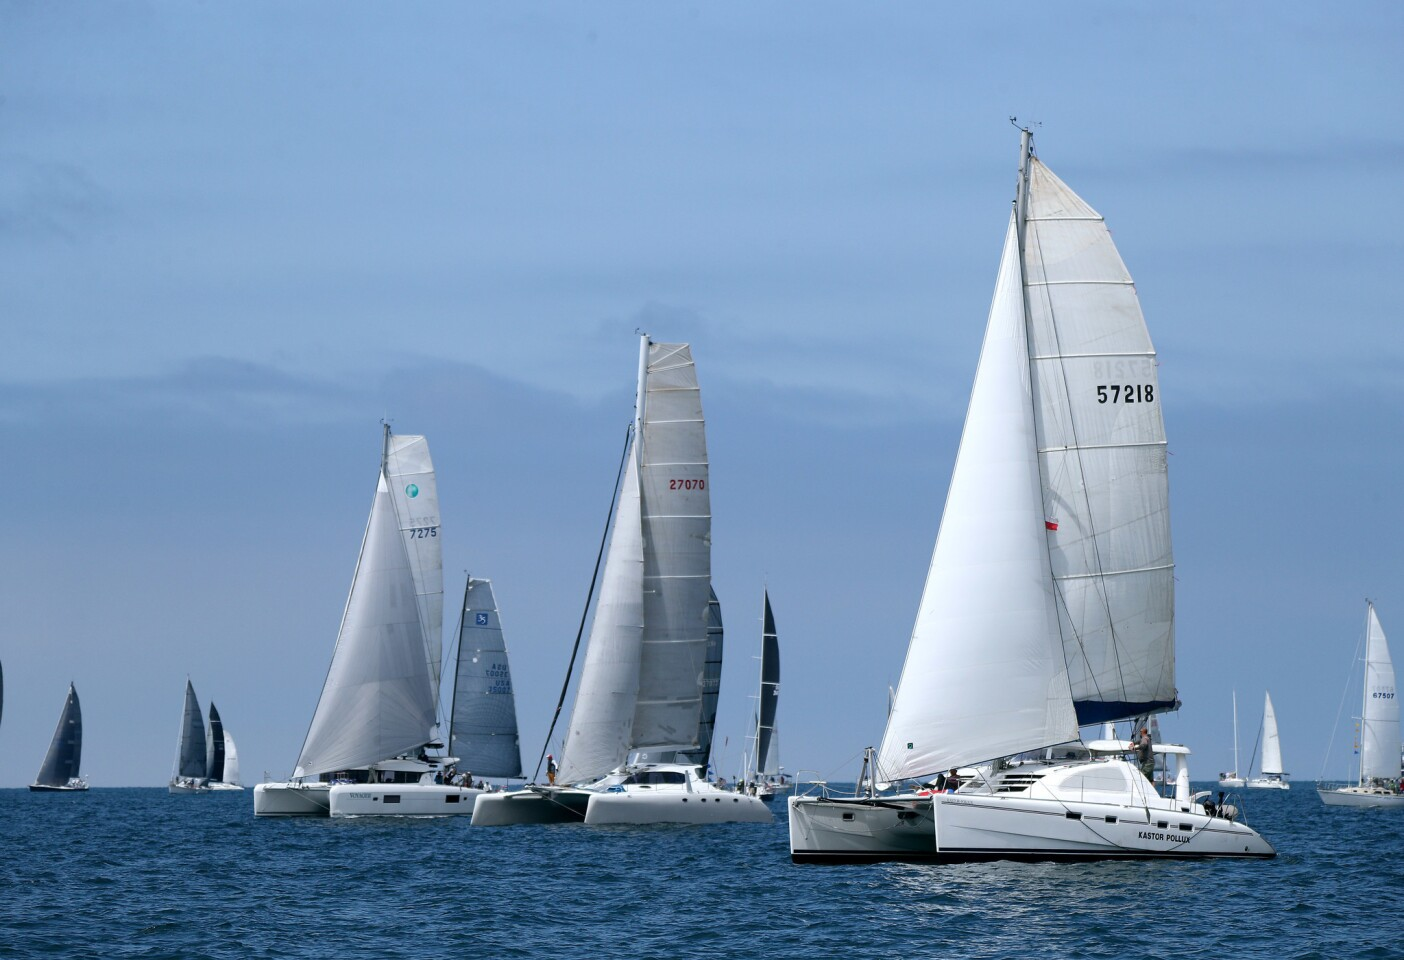 Photo Gallery: Newport to Ensenada International Yacht Race